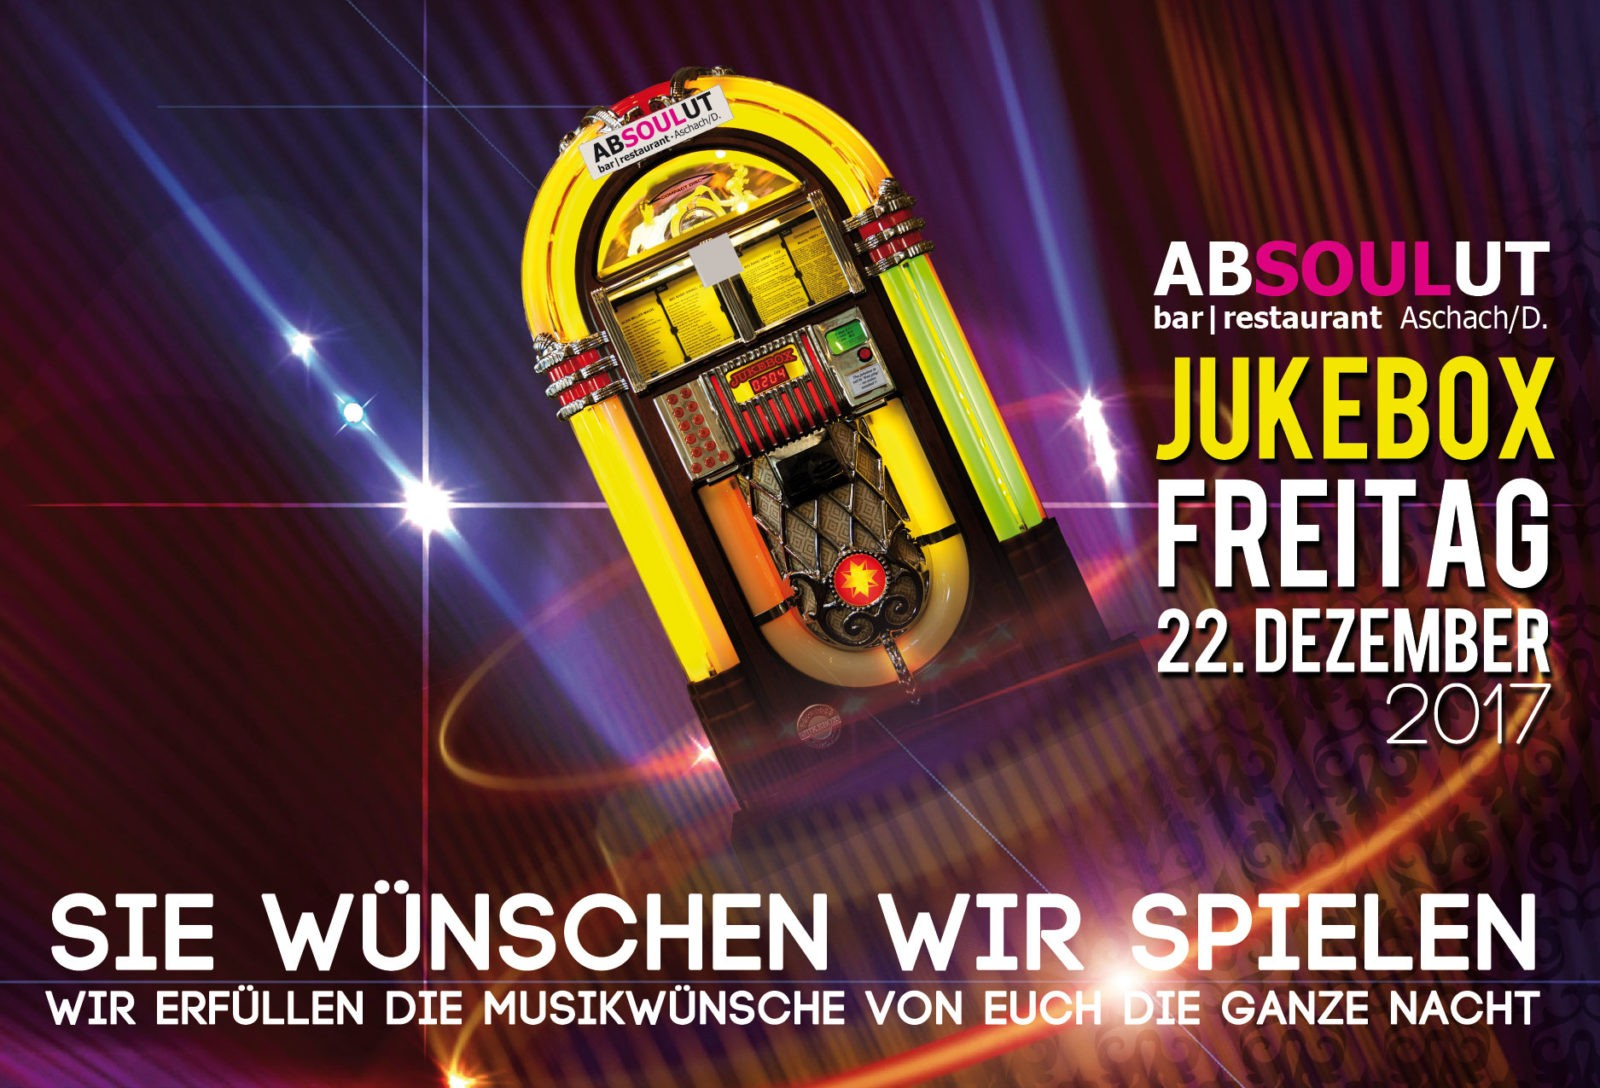 Absolut Bar Restaurant Events - Jukebox